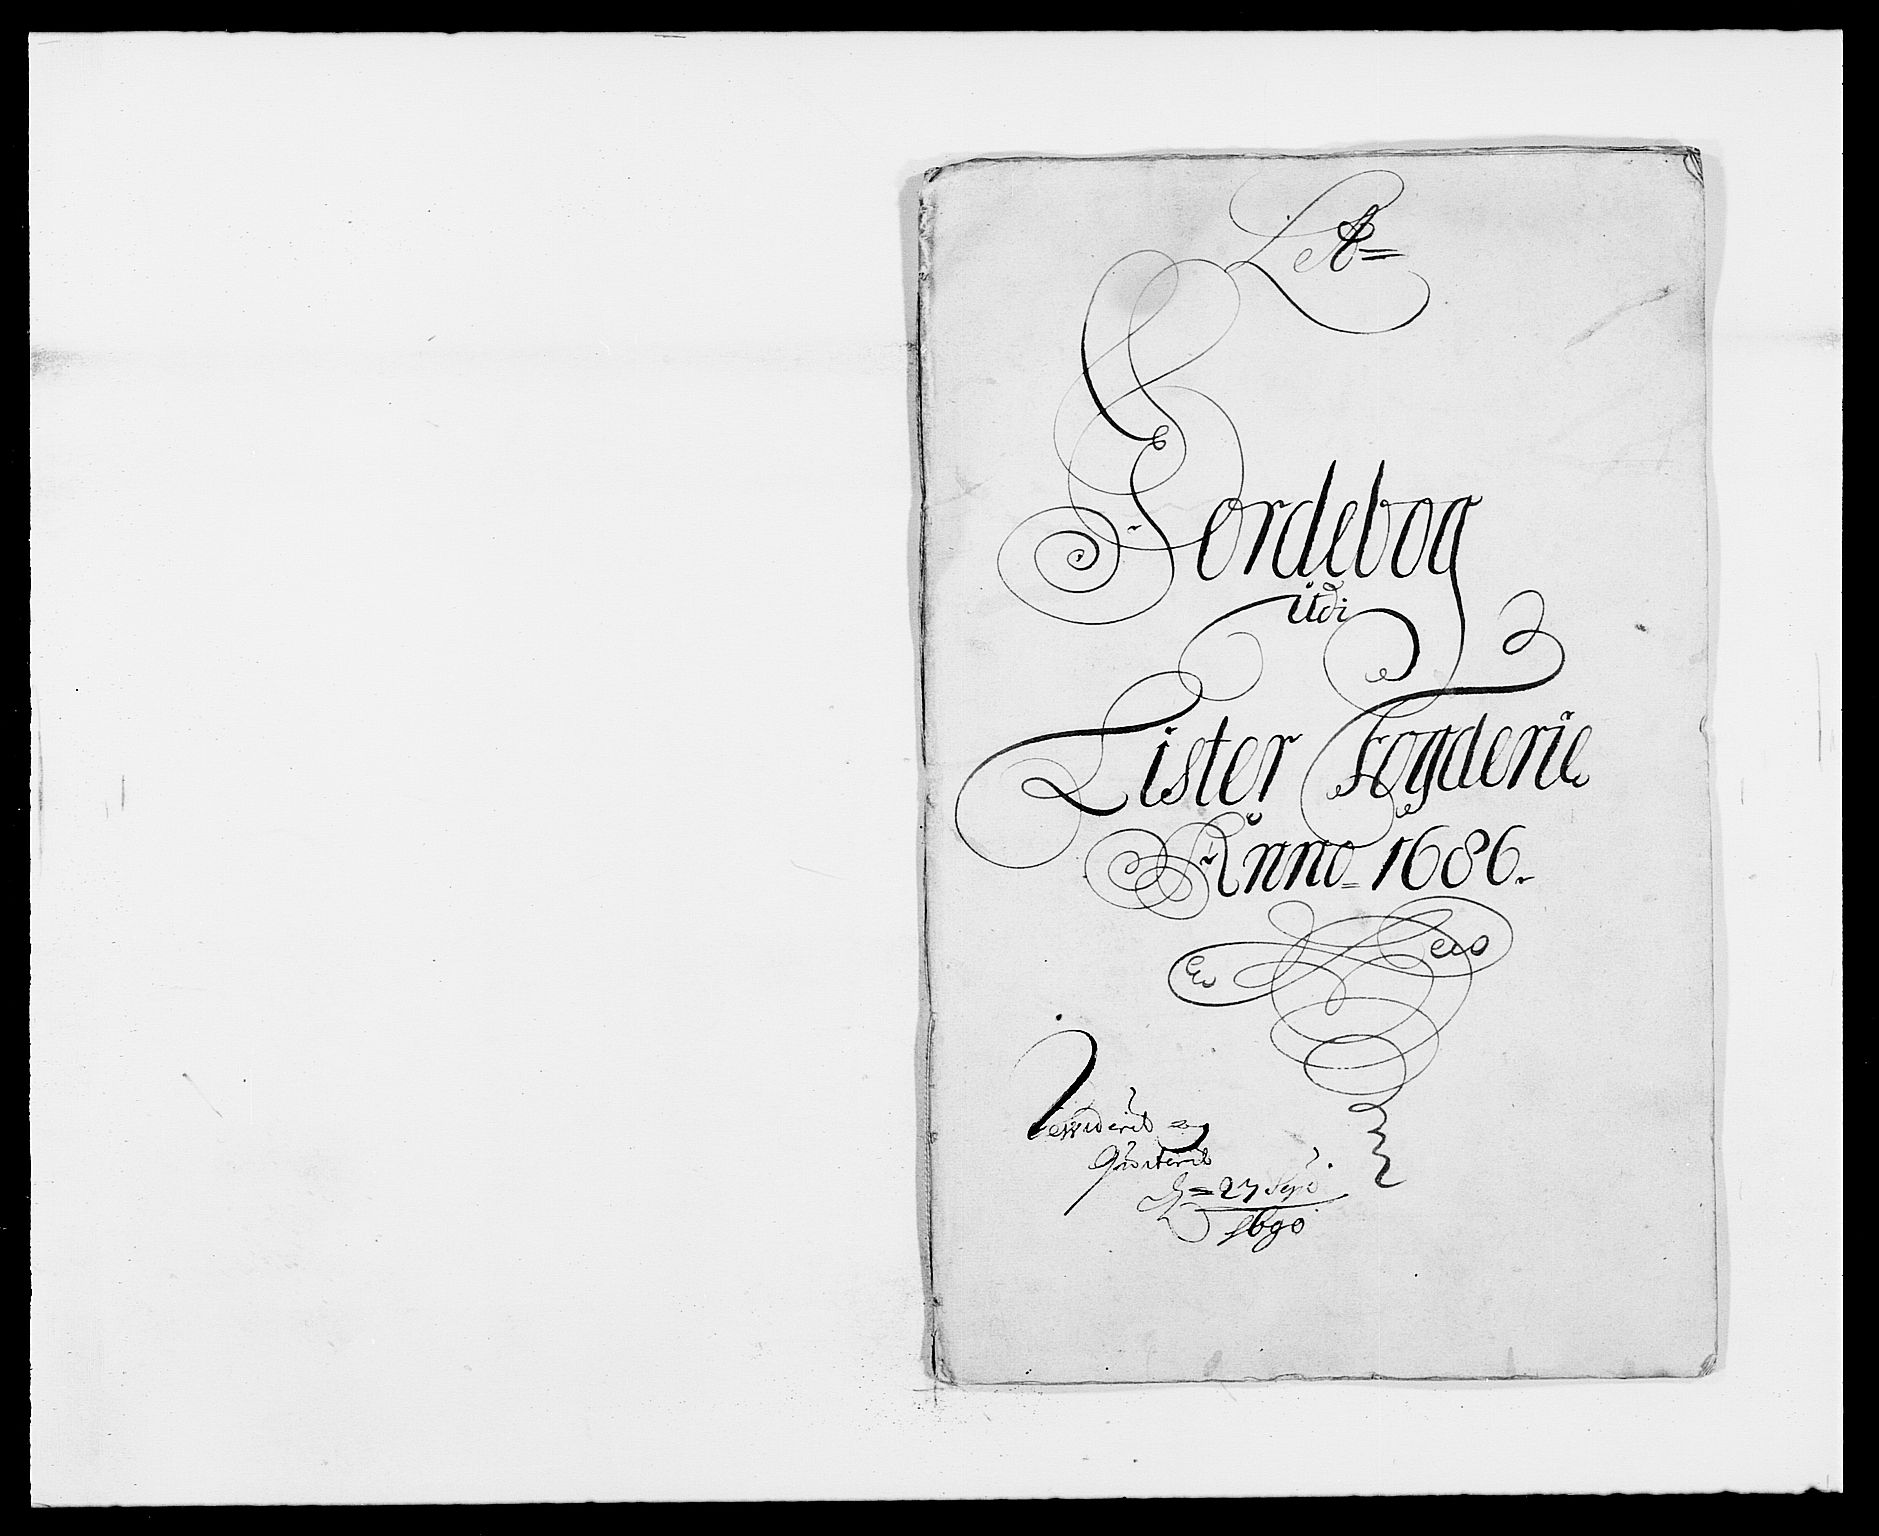 RA, Rentekammeret inntil 1814, Reviderte regnskaper, Fogderegnskap, R41/L2534: Fogderegnskap Lista, 1686-1688, s. 29